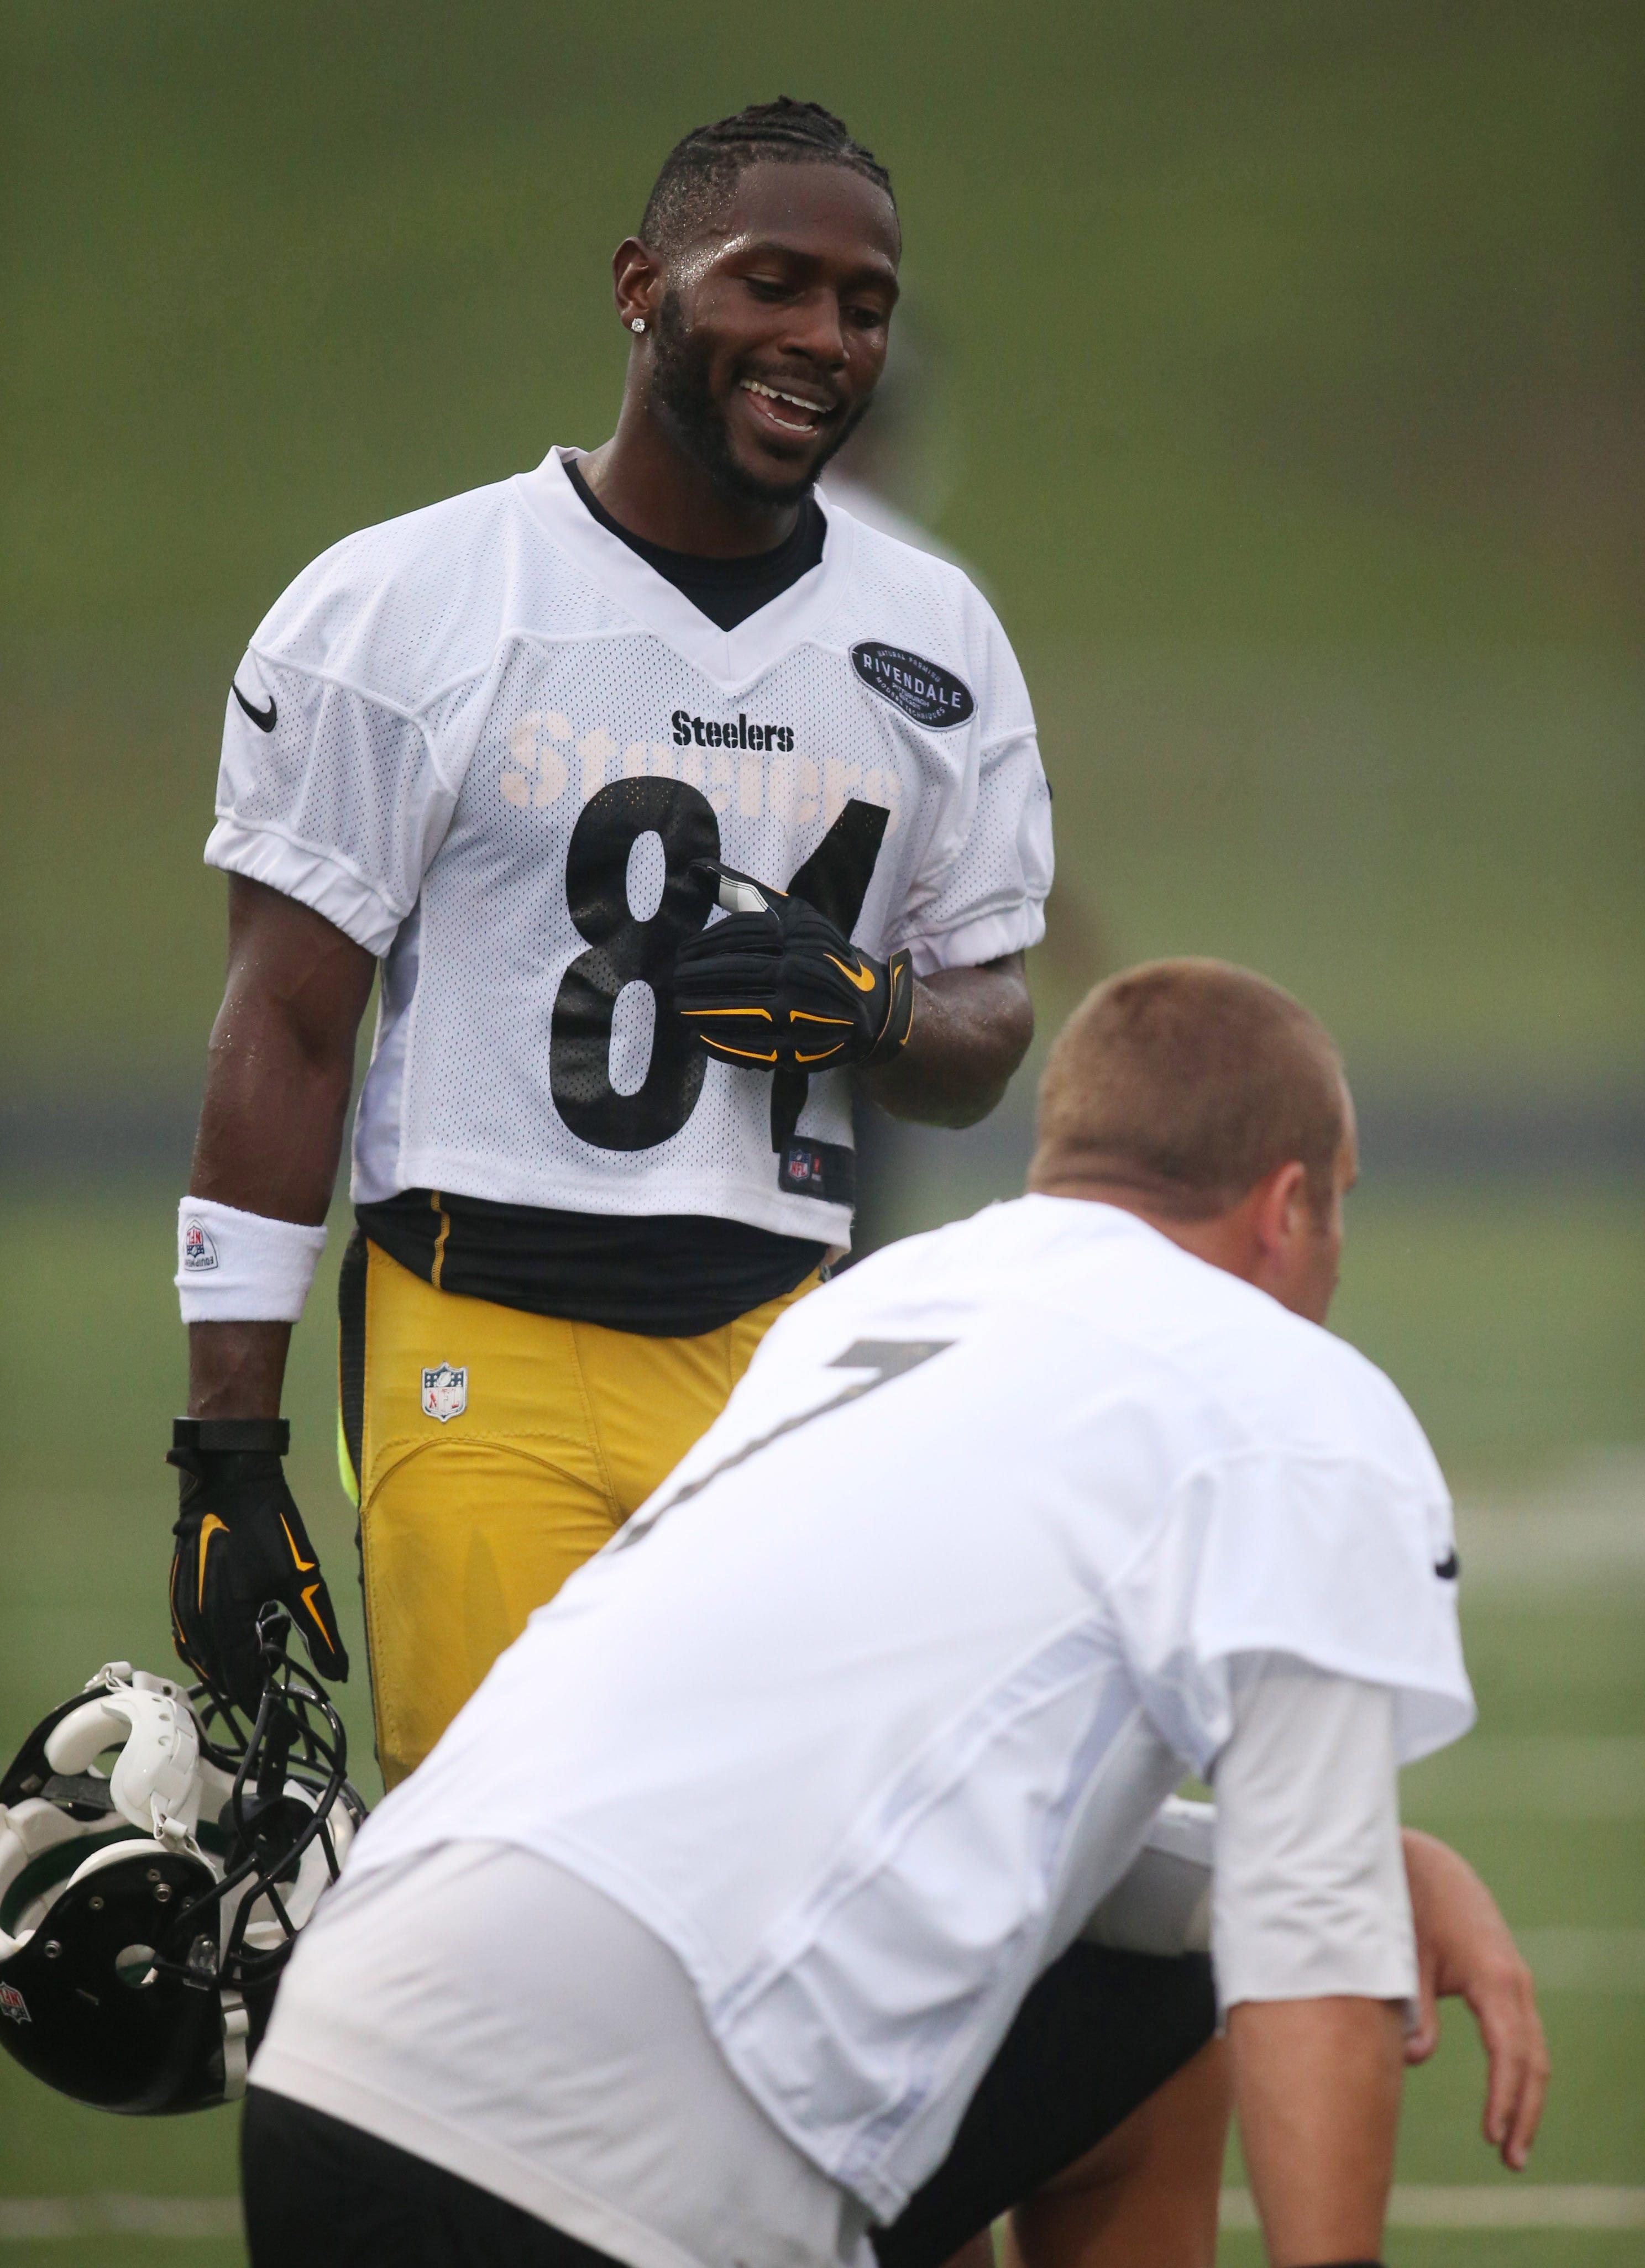 Steelers WR Antonio Brown rips QB Ben Roethlisberger on LeBron James' 'The Shop'